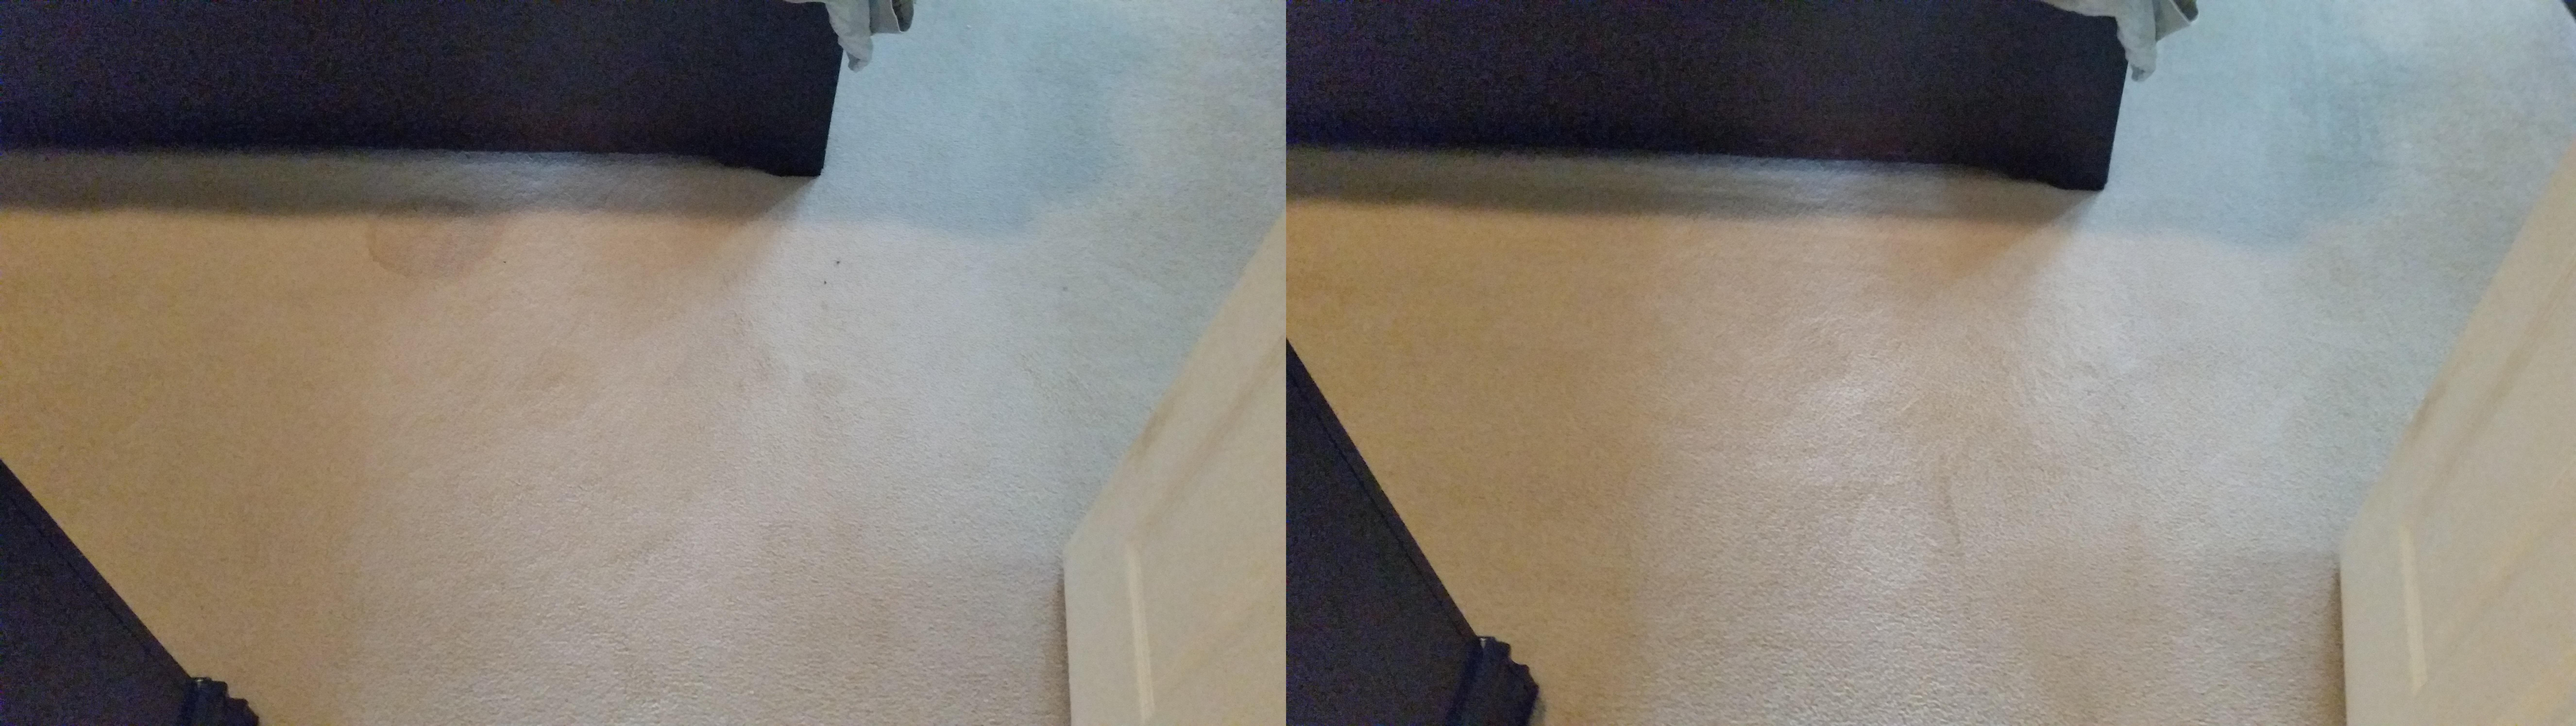 11-10-14-b-a-citrusolution-carpet-cleaning-suwanee-11